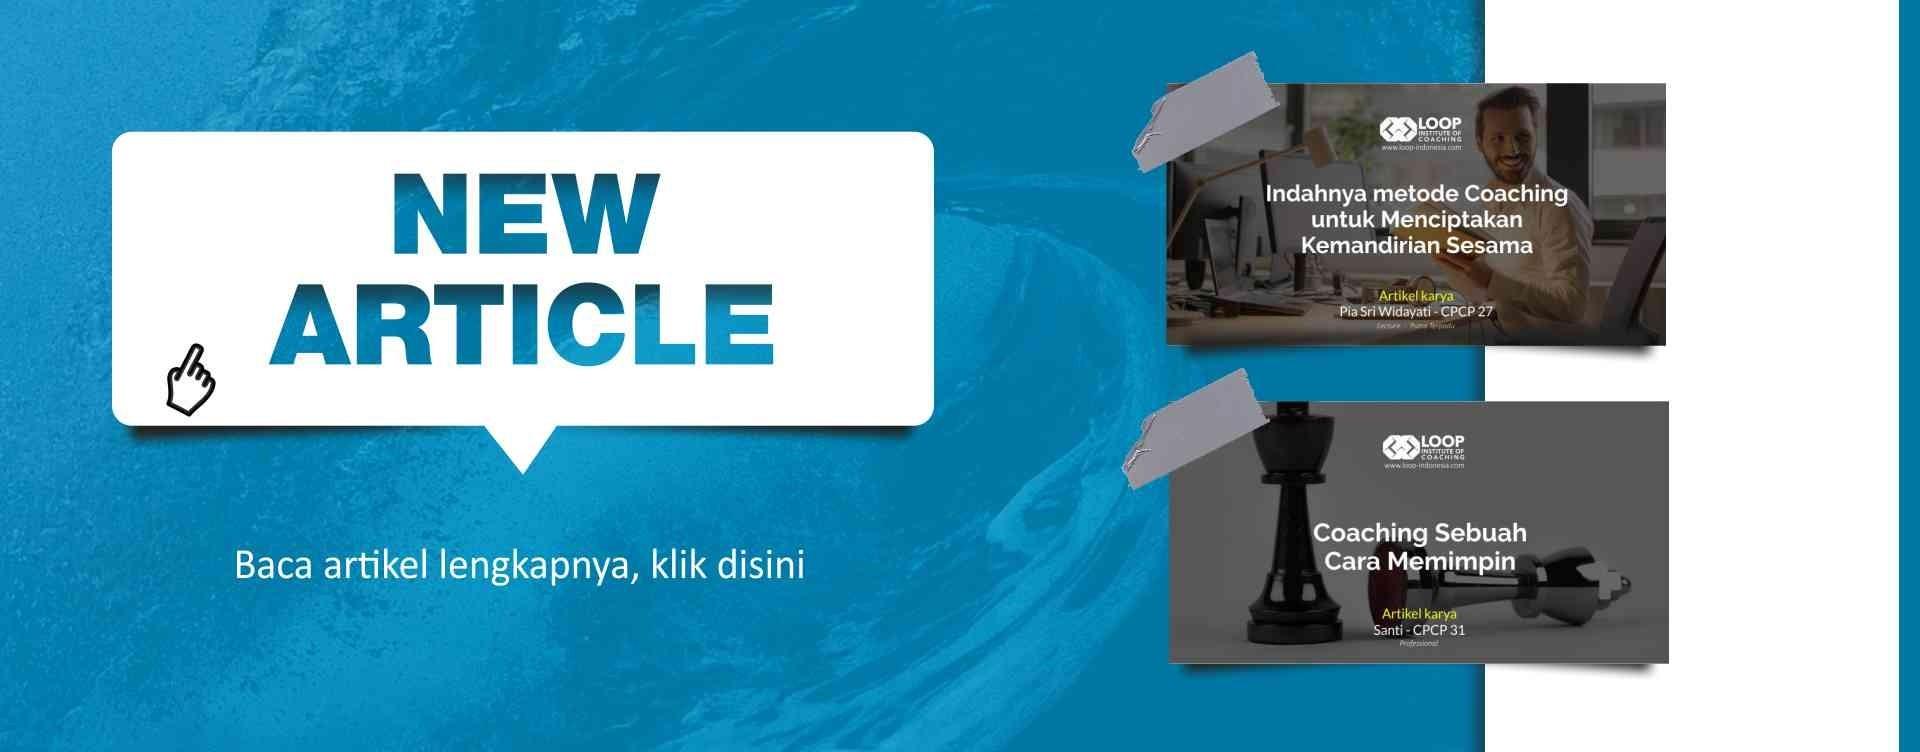 slider loop-indonesia